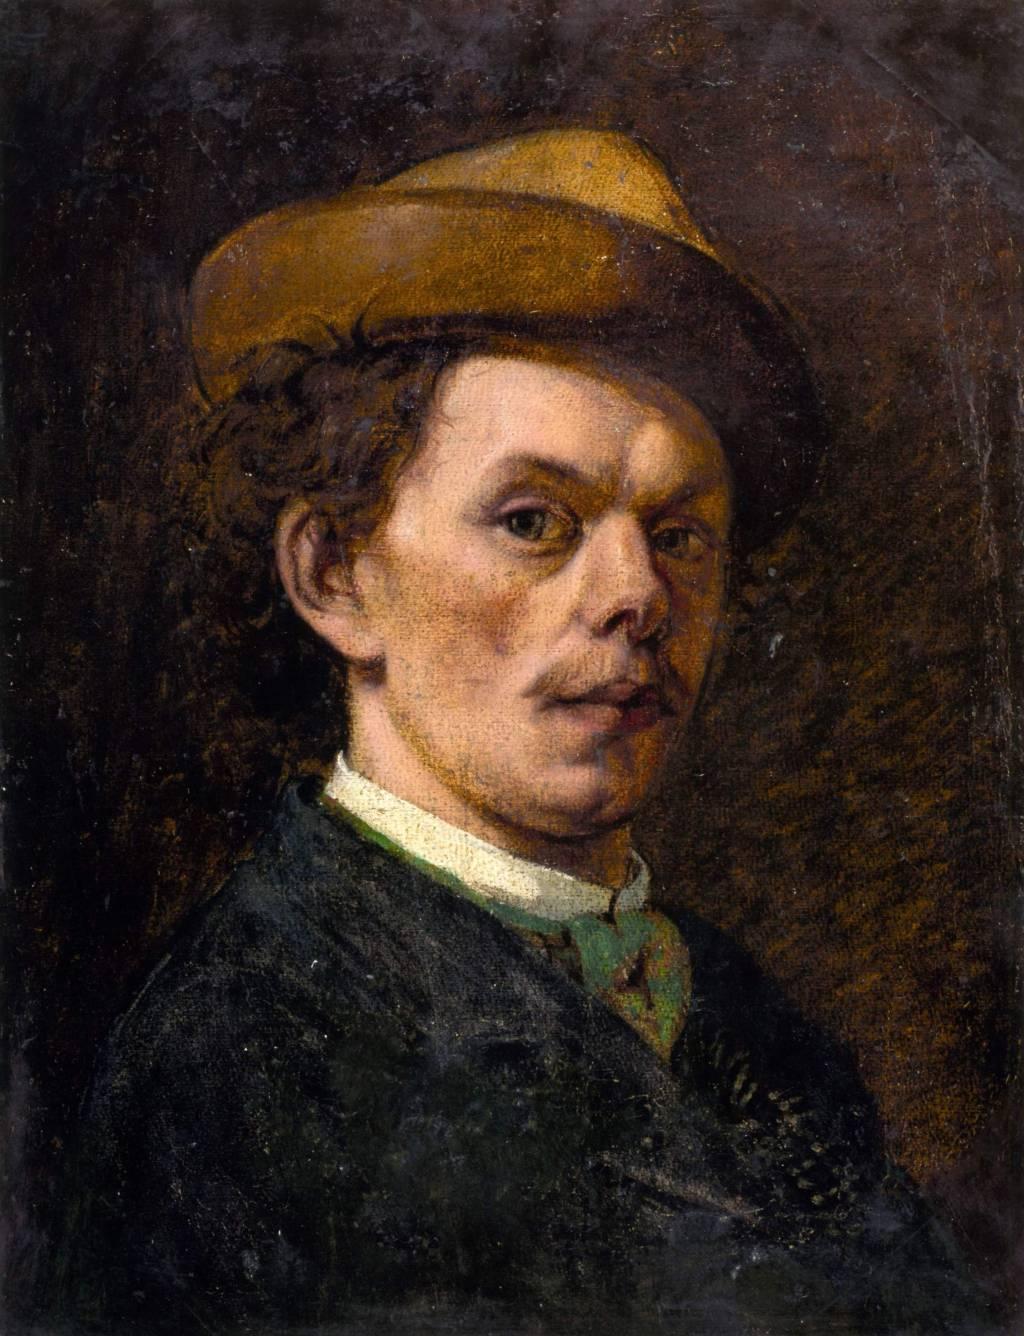 KopystinskijAvtoportret1871-1872.jpg